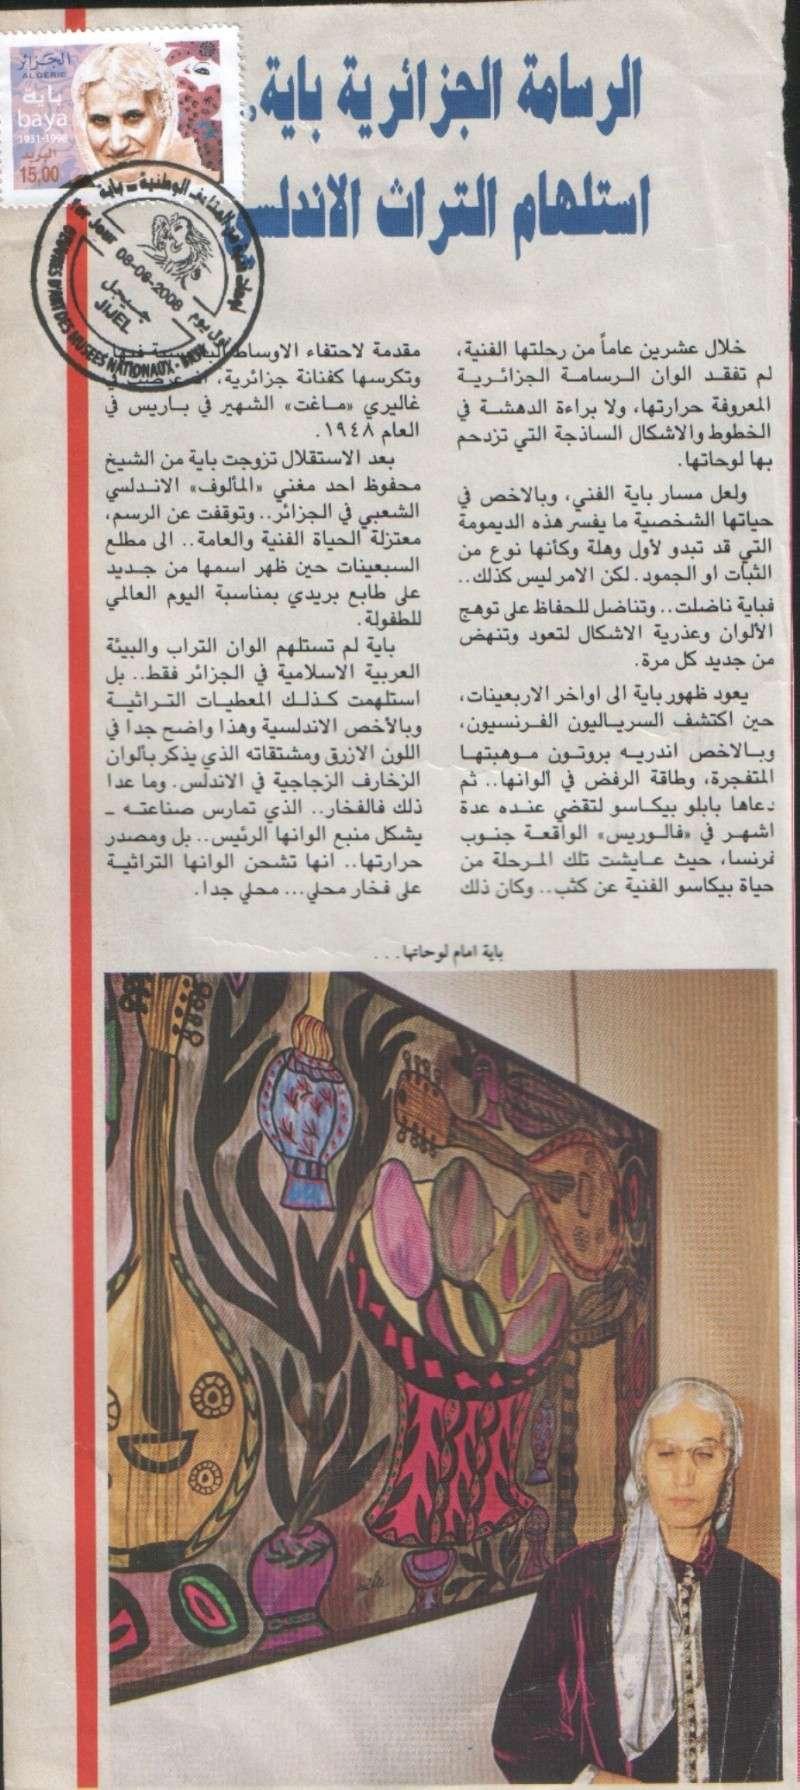 A/S oeuvres d'art des musées nationaux. Img00429